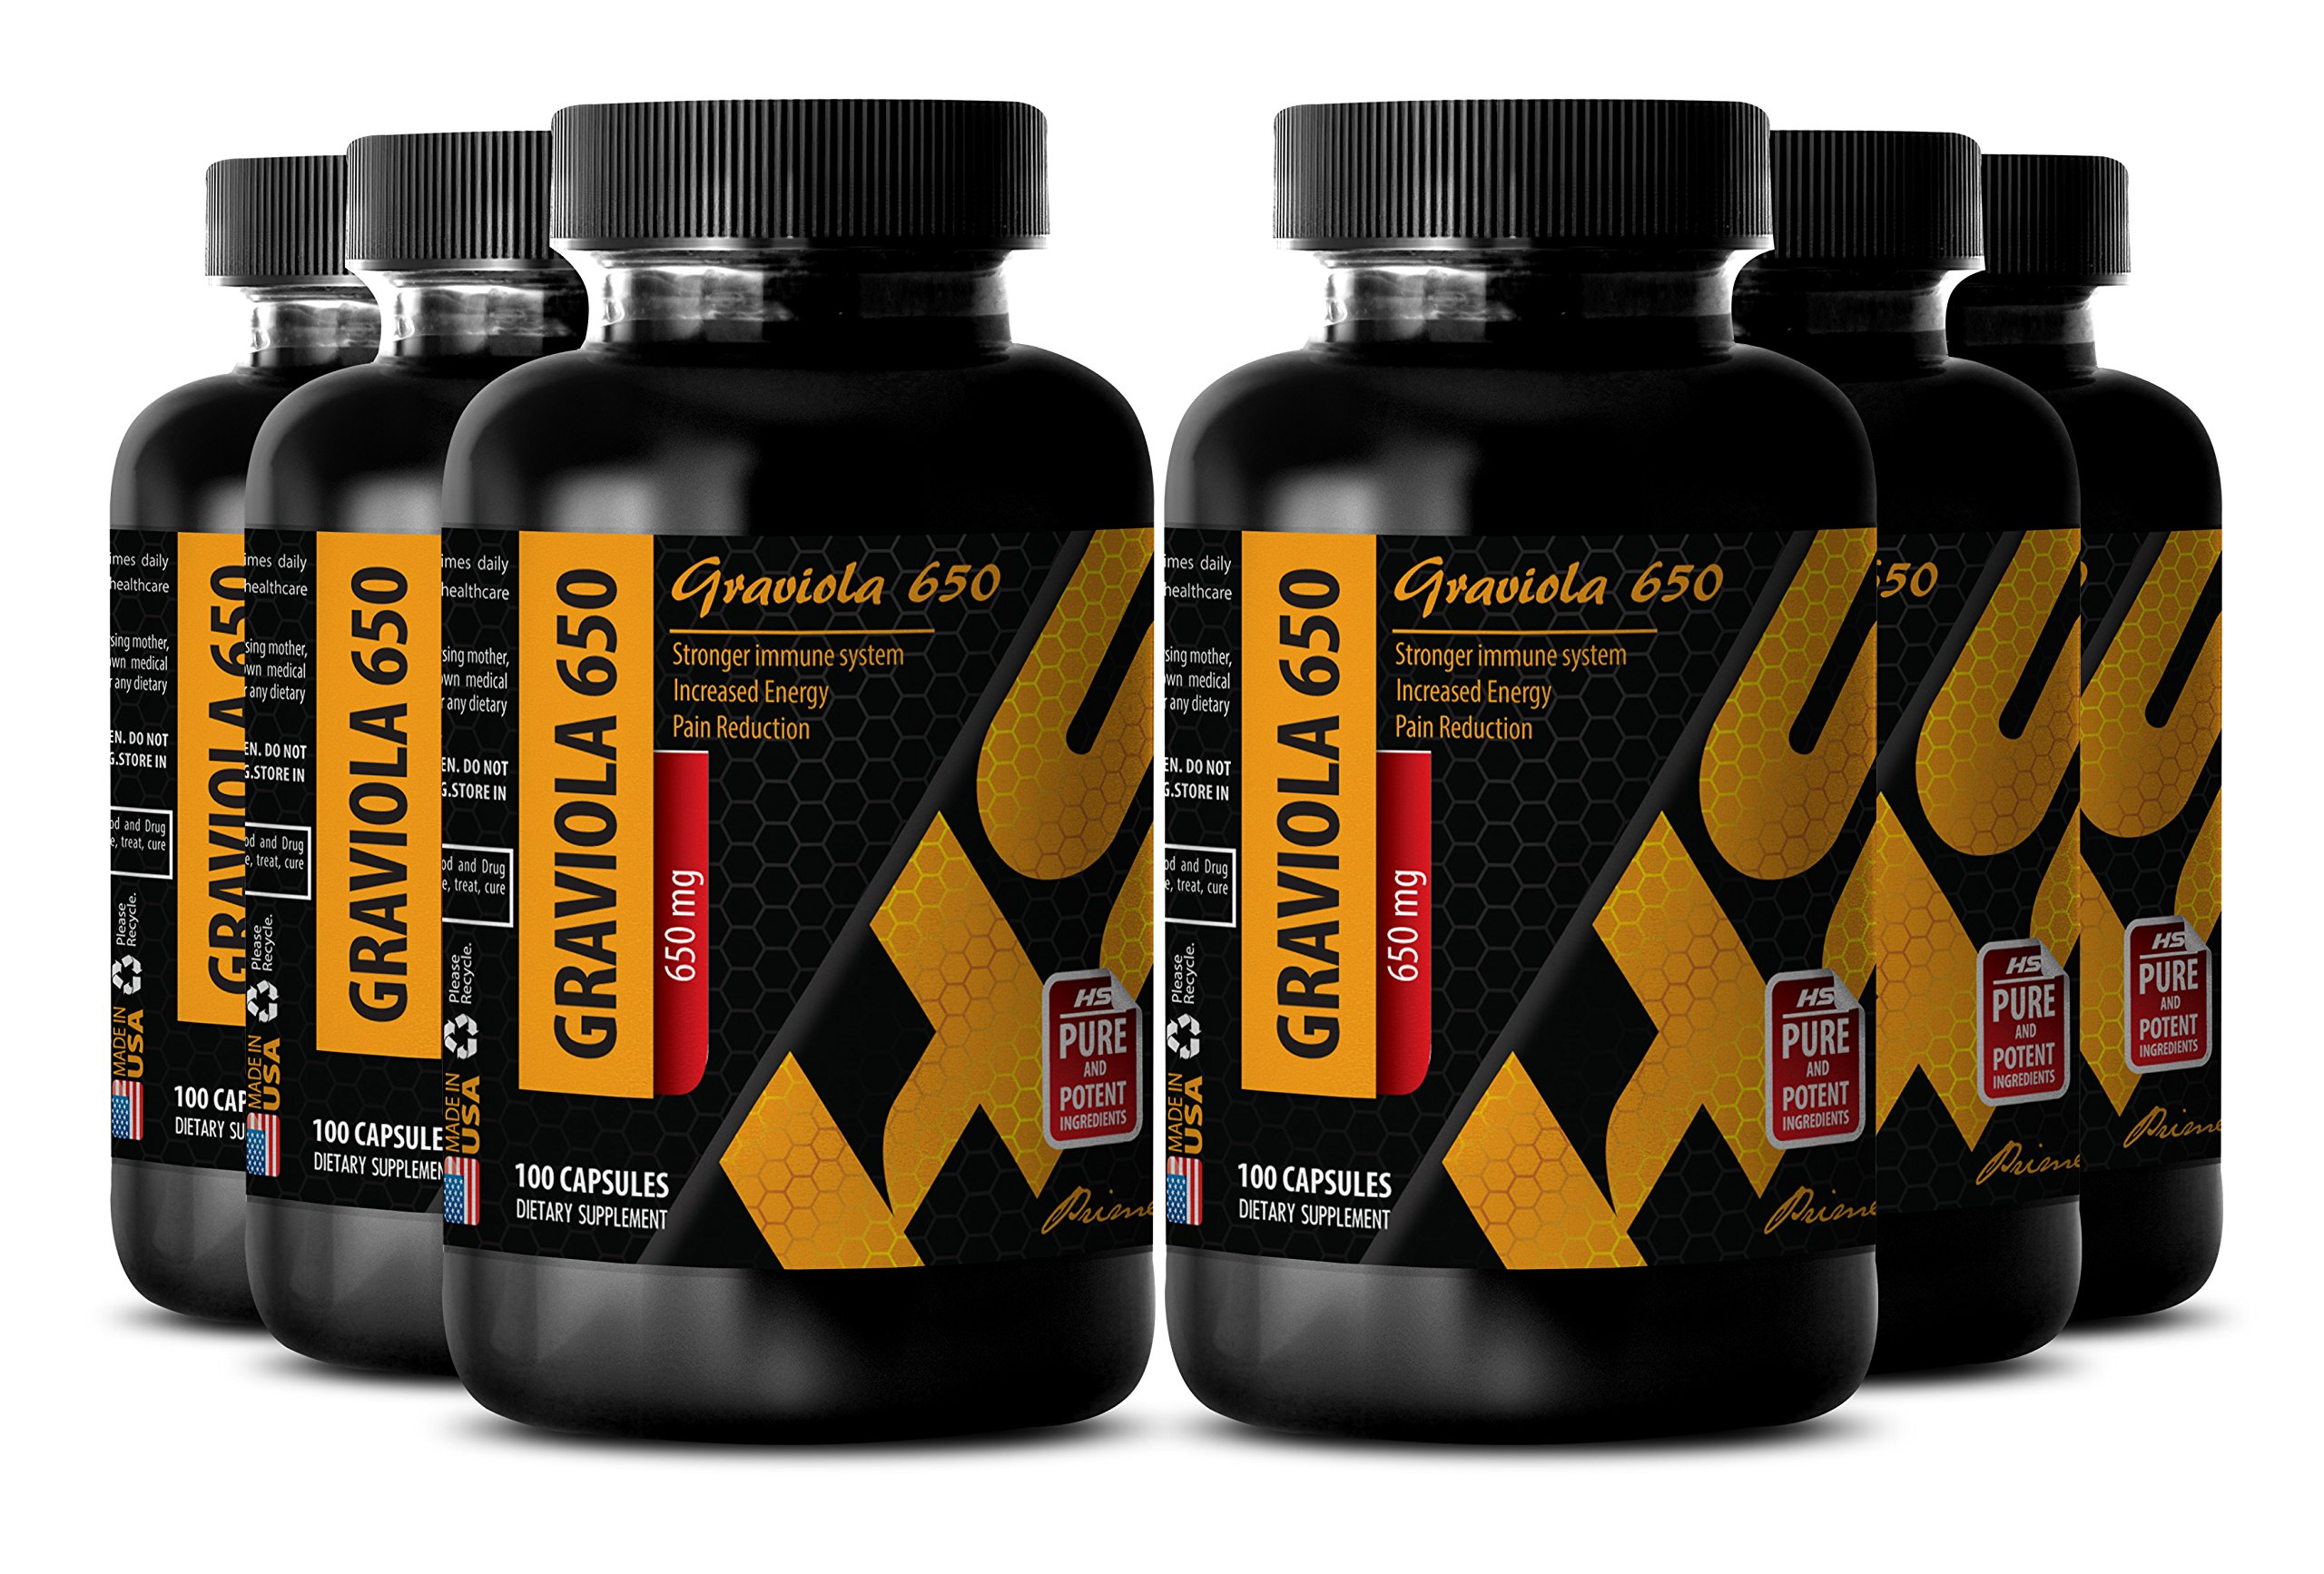 Pancreas support - GRAVIOLA EXTRACT - Calcium supplement for women - 6 Bottles 600 Capsules